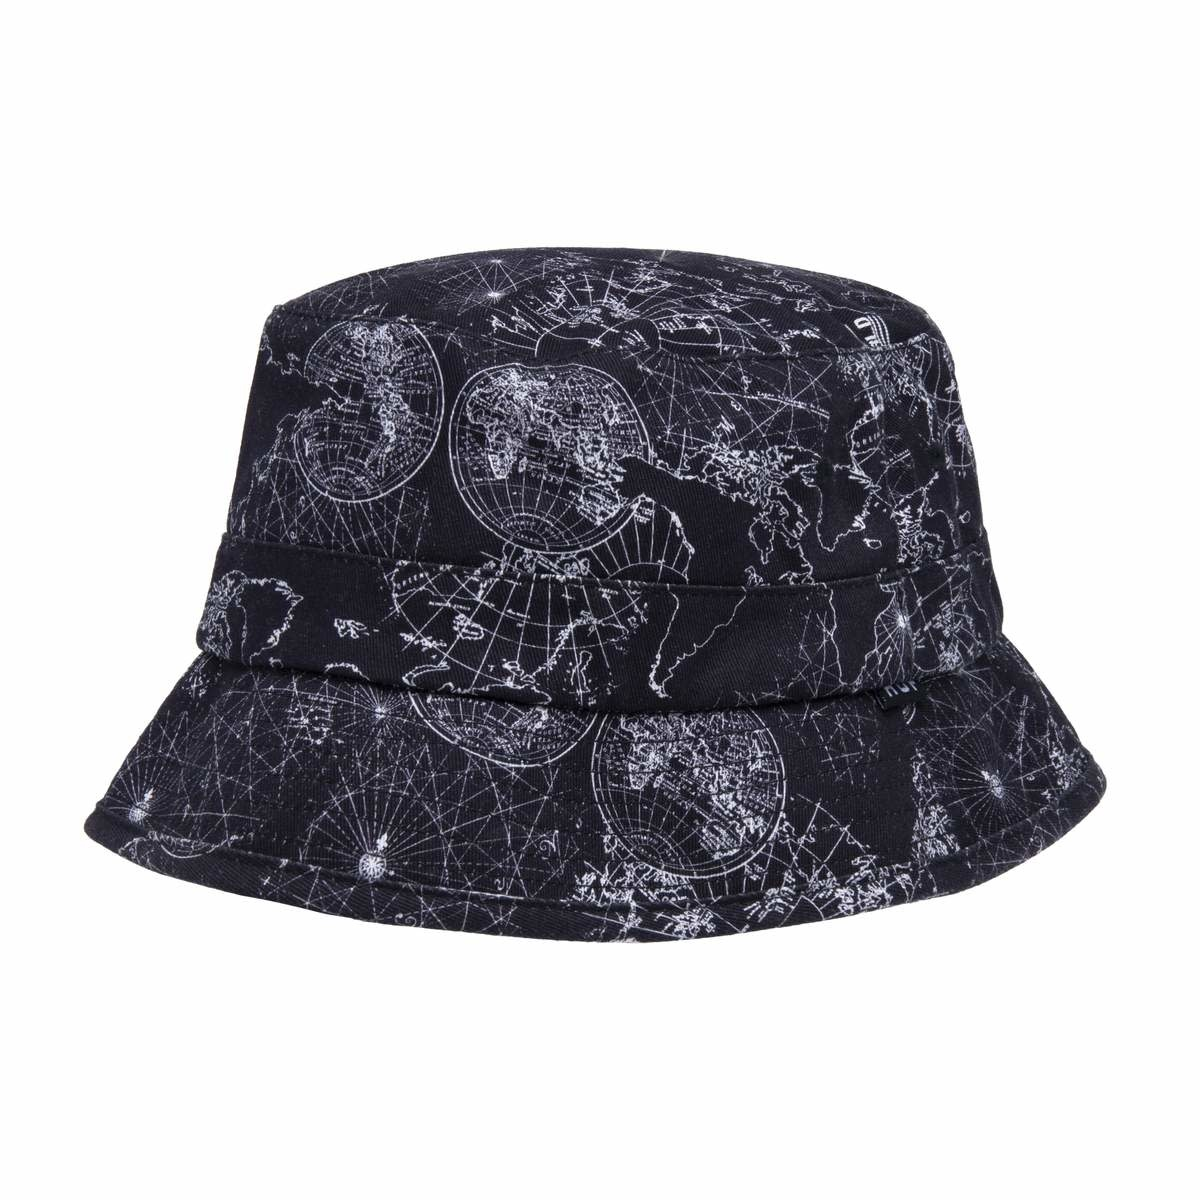 HUF Nicolet Bucket Black L/XL